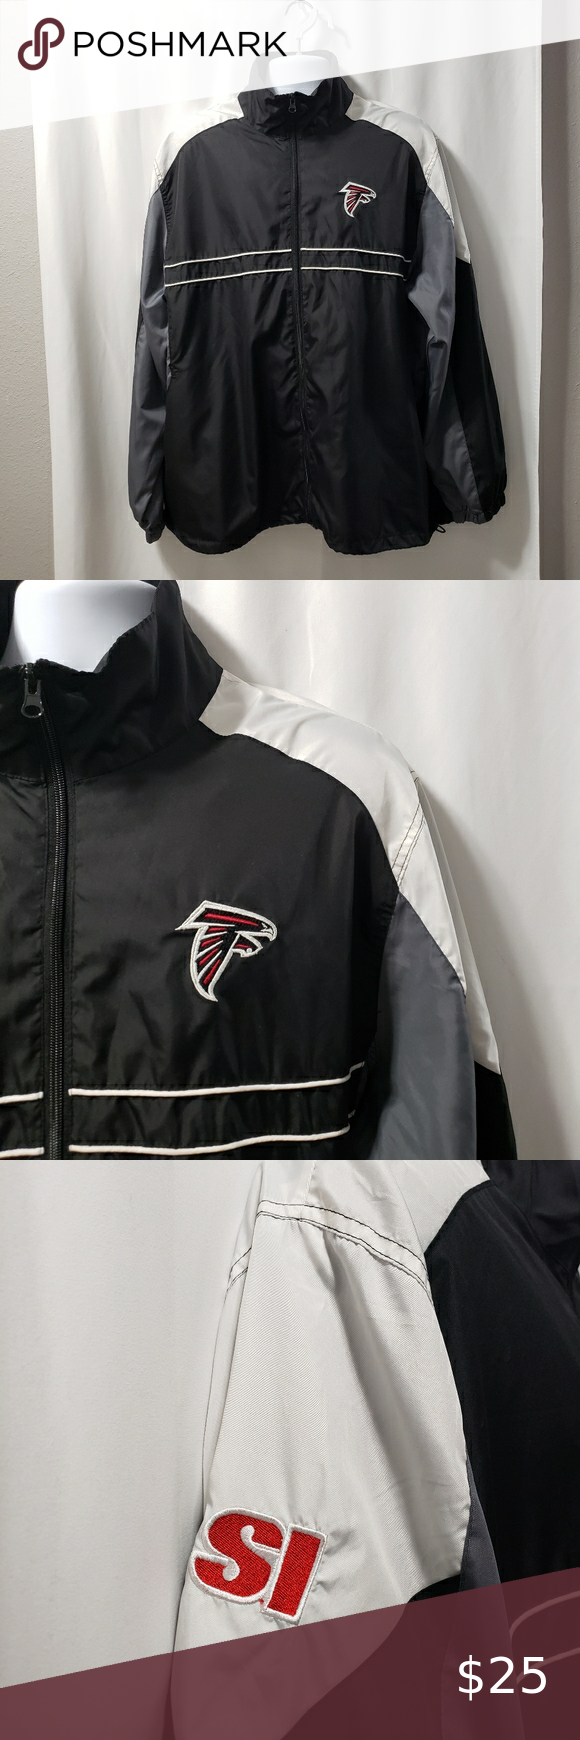 Atlanta Falcons Jacket Dunbrooke Nfl Si Xl Atlanta Falcons Lightweight Full Zip Jacket Made By Dunbrooke Promot Sport Outfits Lightweight Shirts Clothes Design [ 1740 x 580 Pixel ]